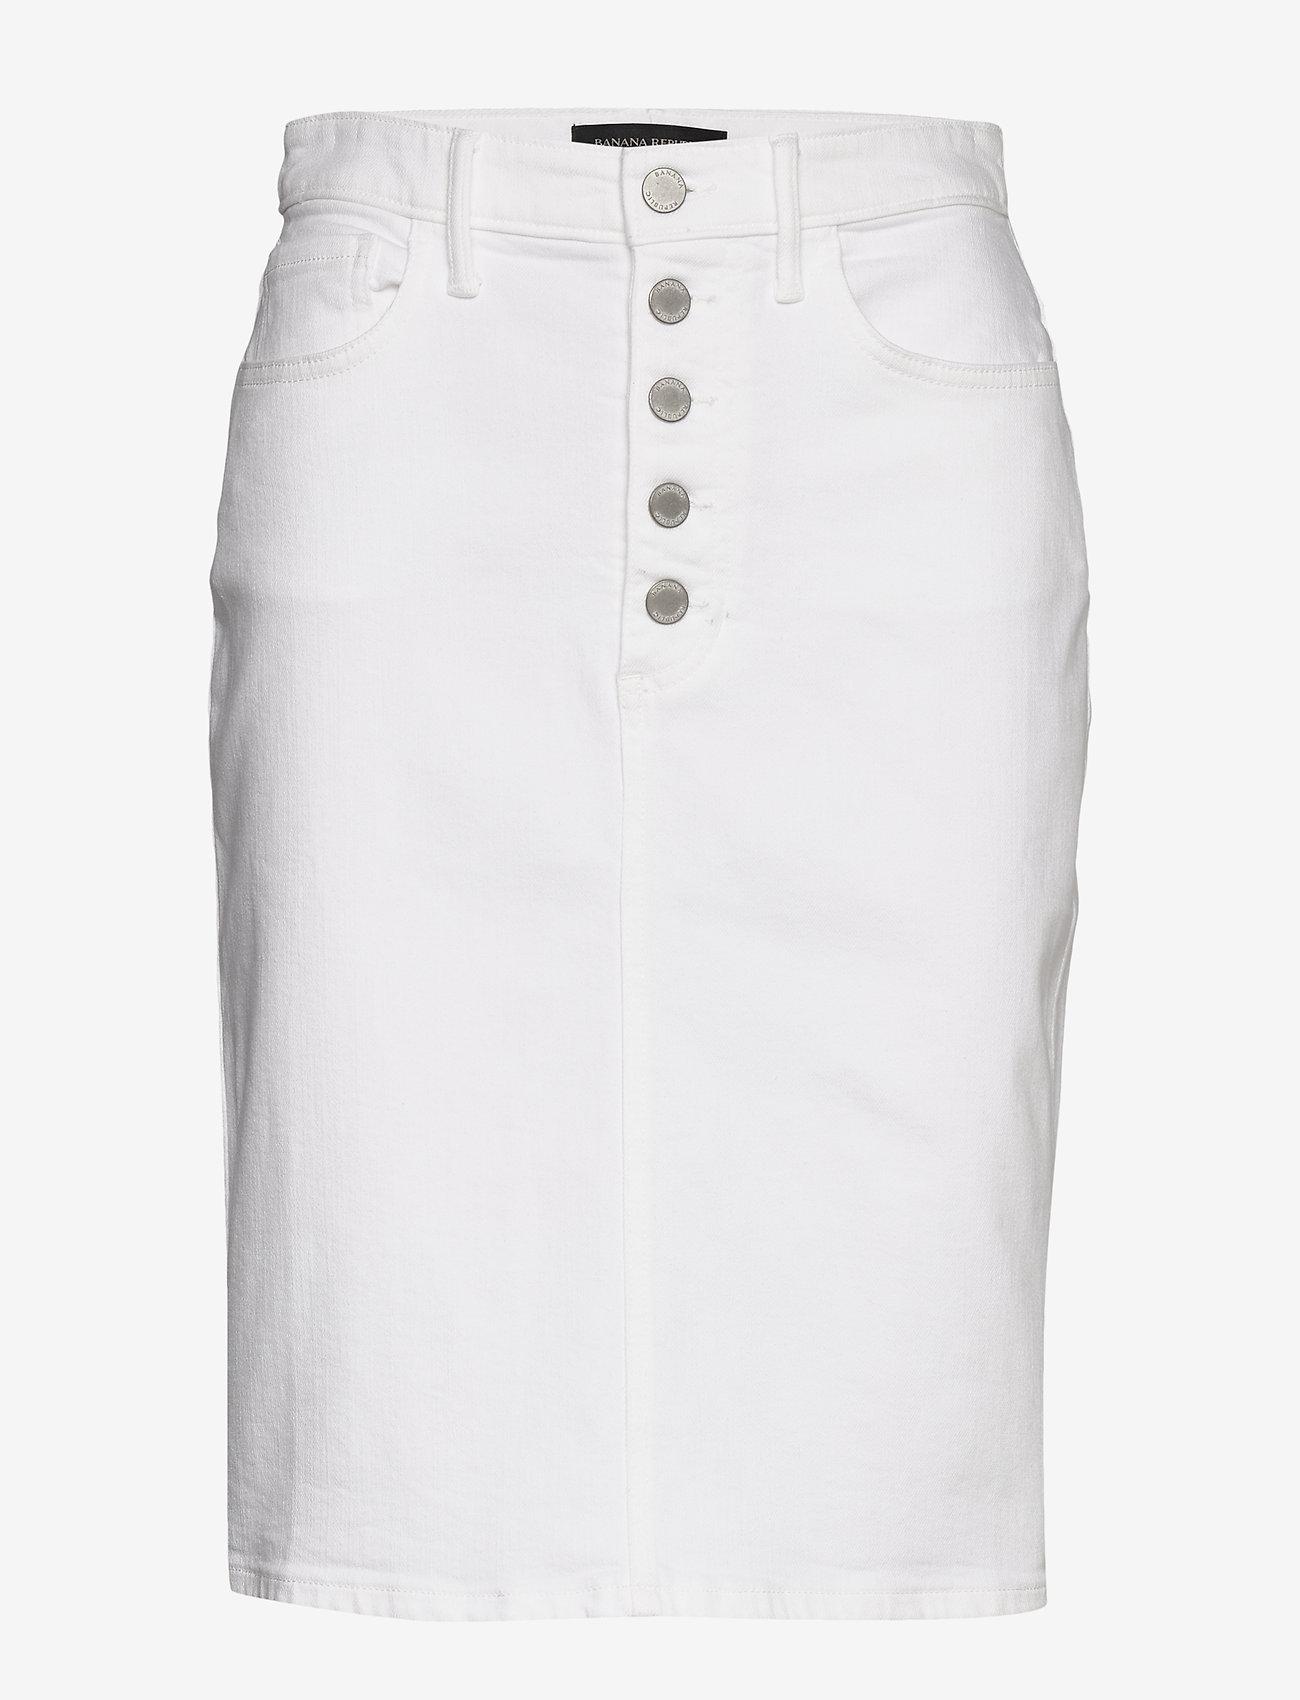 Banana Republic - Button-Fly Denim Pencil Skirt - denim skirts - white denim - 0